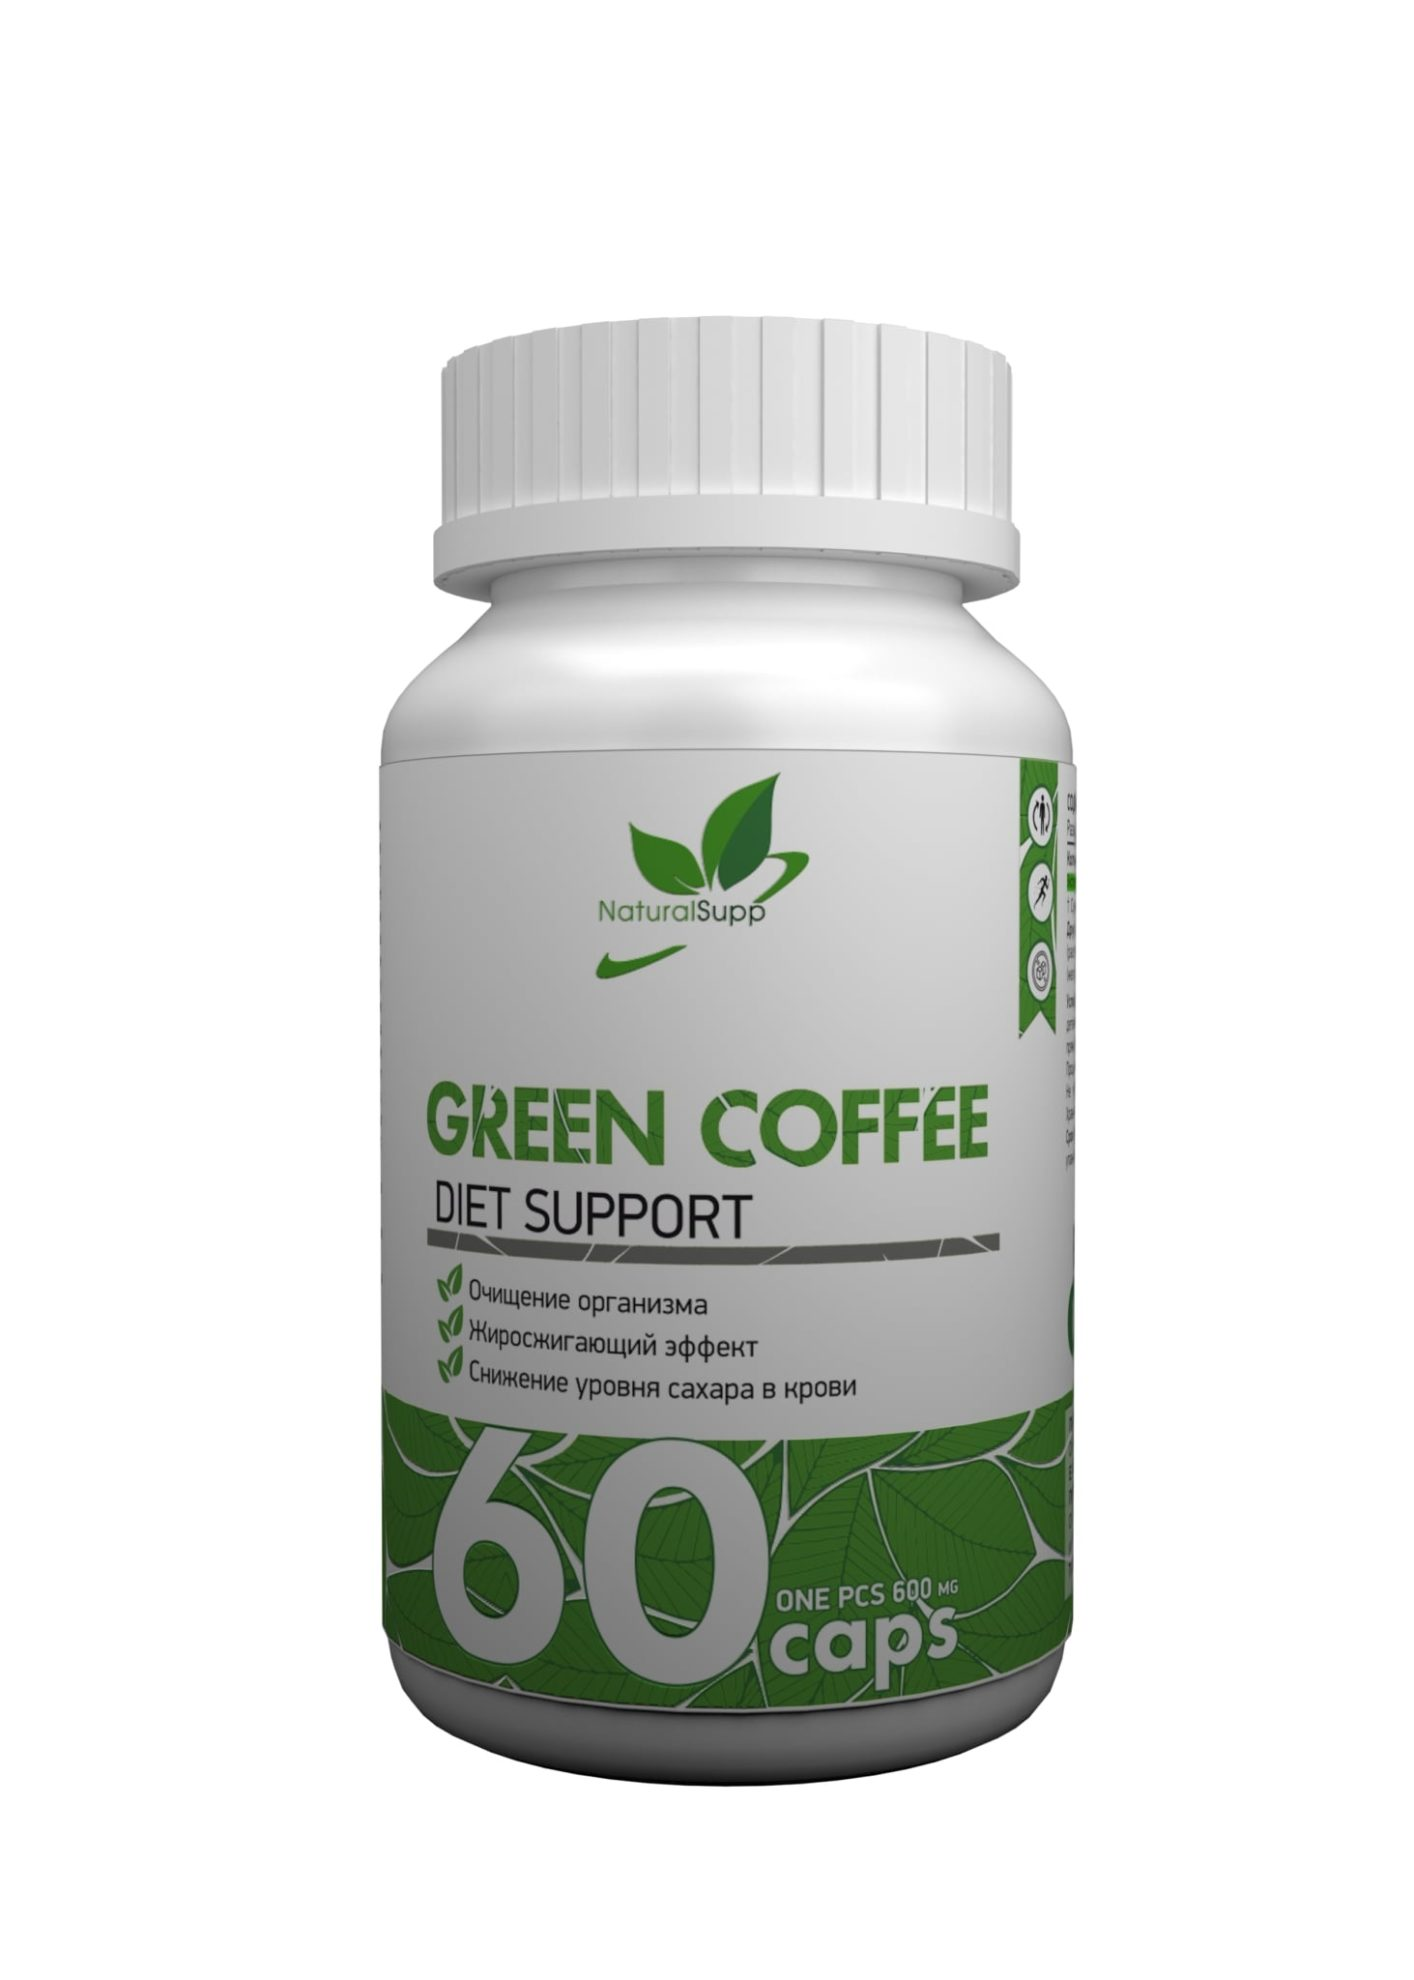 NaturalSupp Green Coffee 400 mg 60 caps